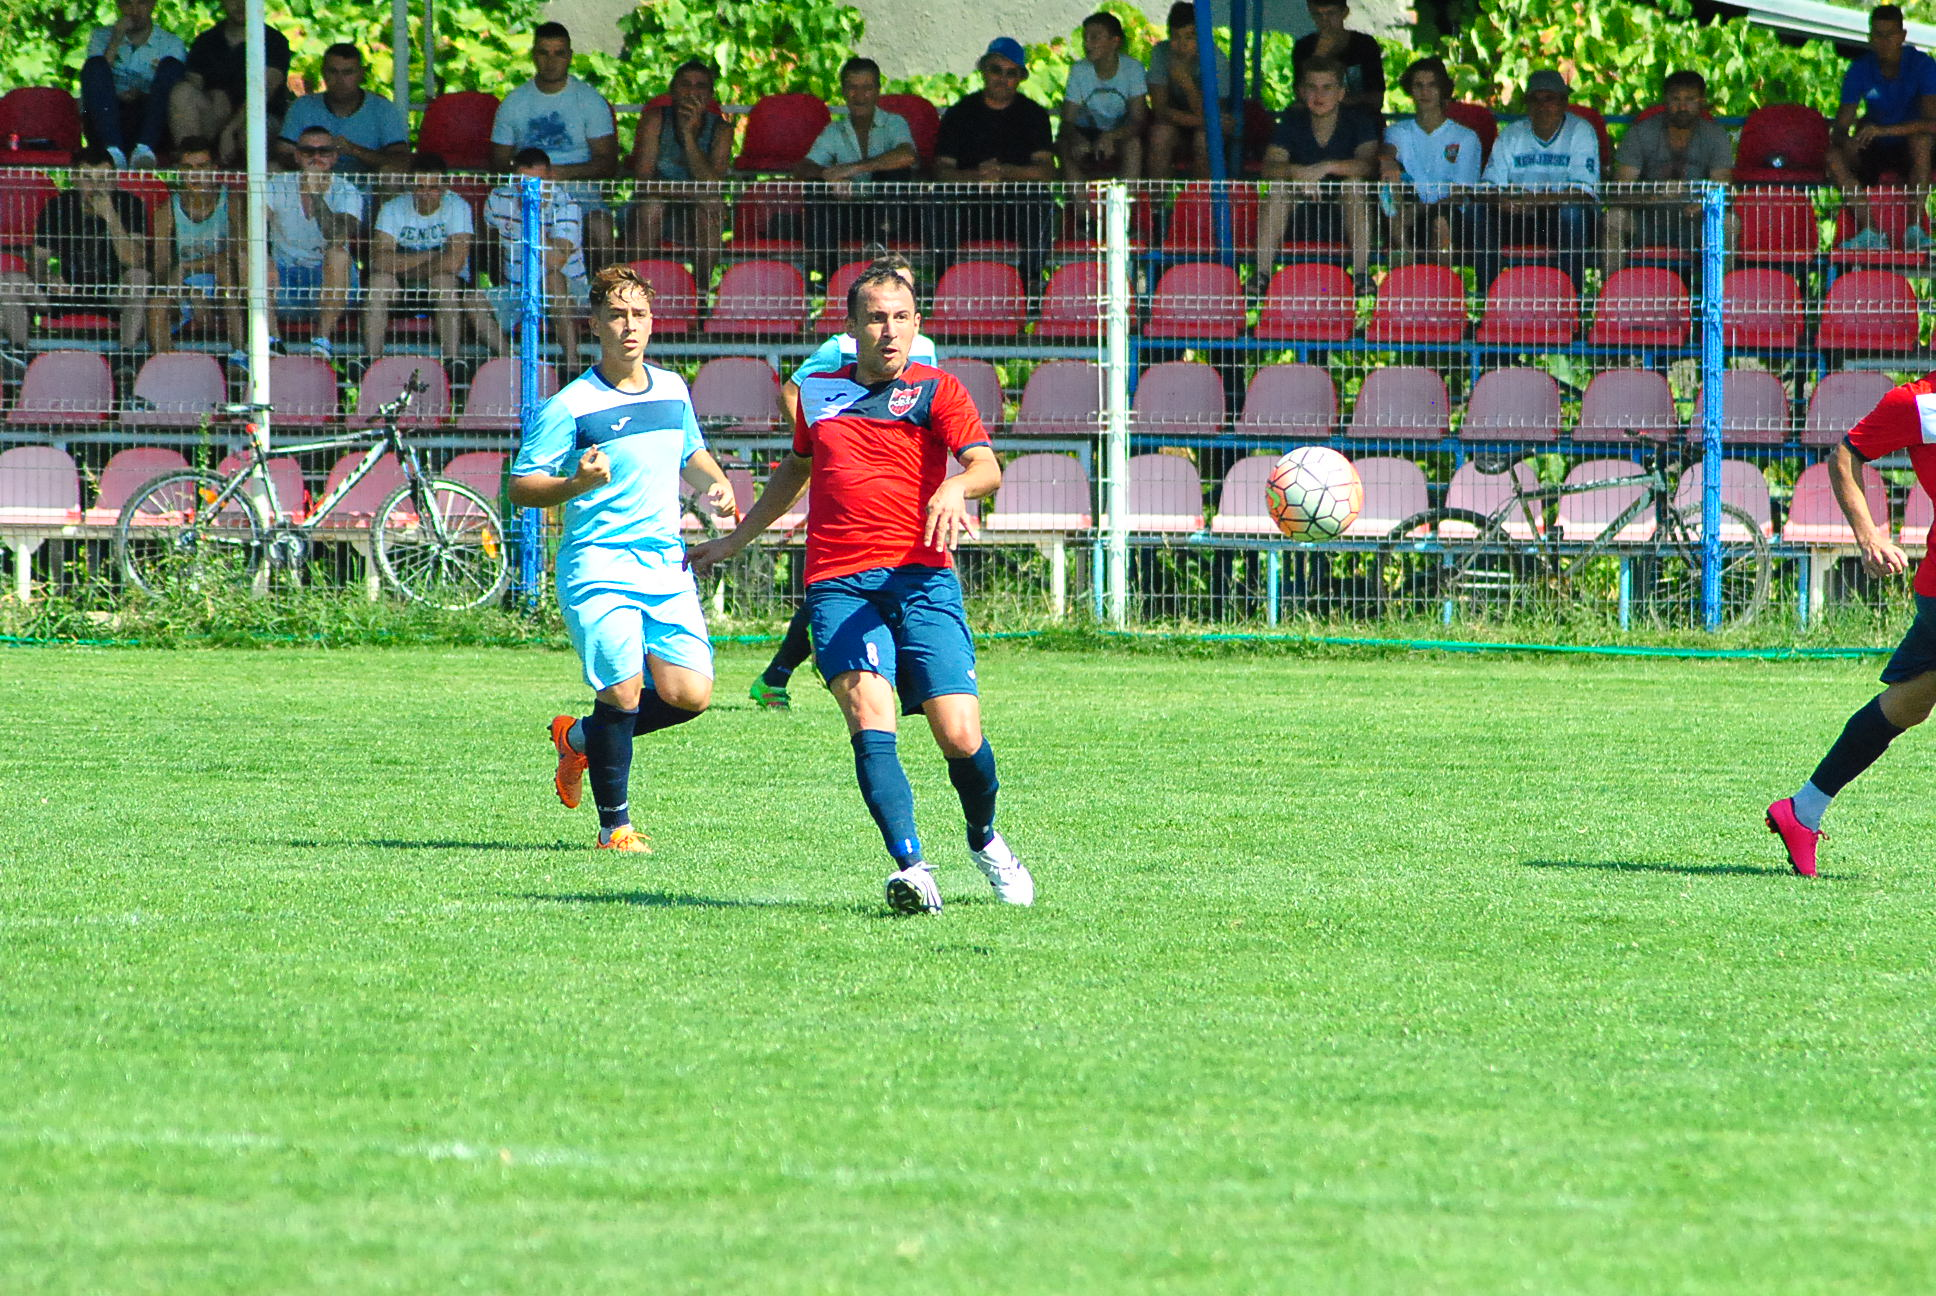 Liga a 4-a Dolj/ Craiova, Podari și Bechet au punctaj maxim